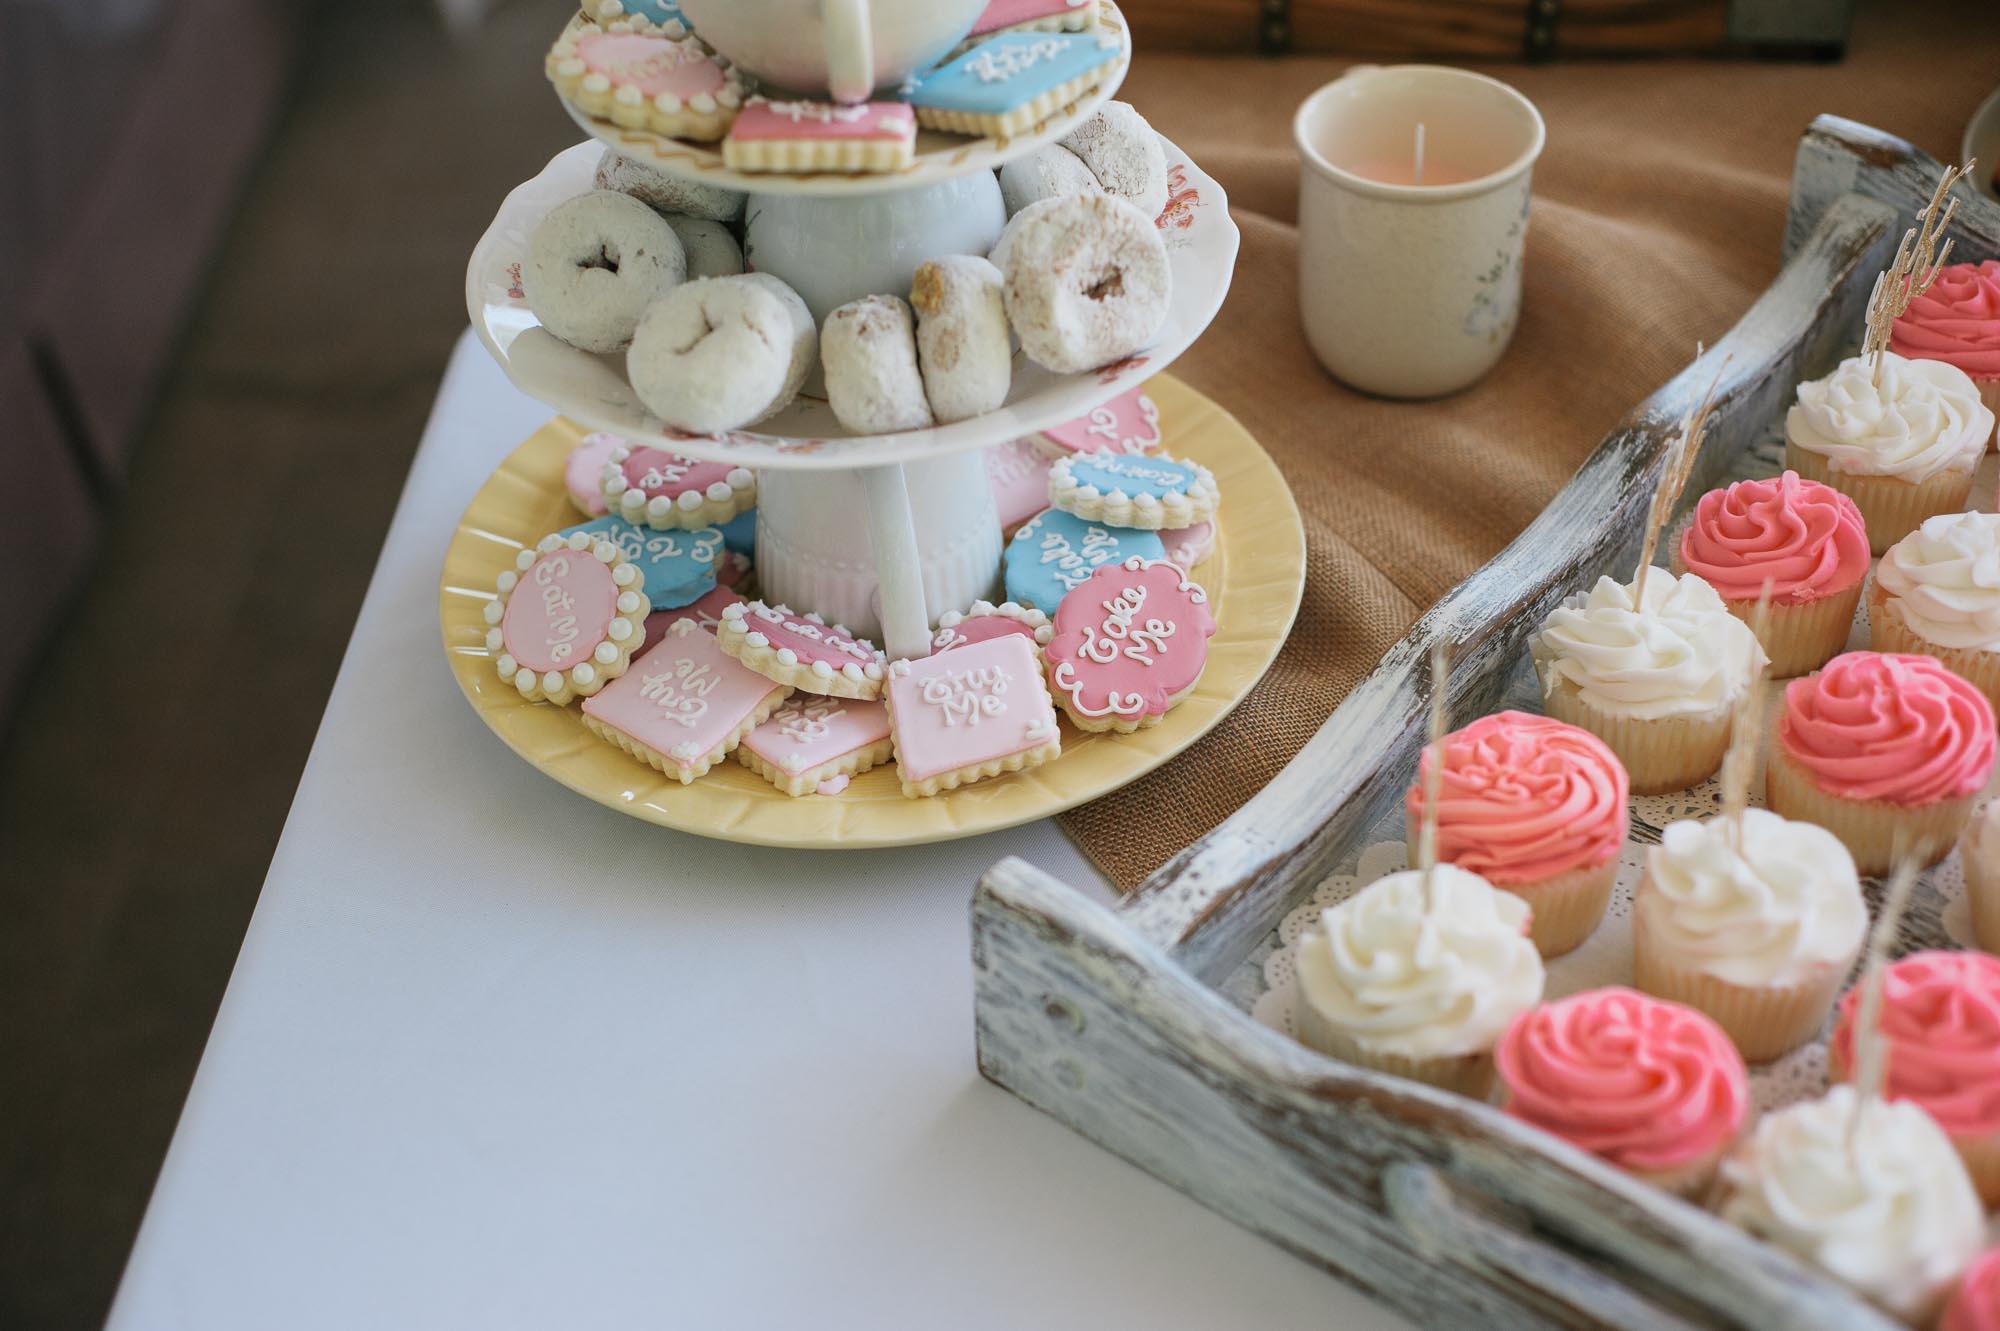 m.newsom-photography-one-year-old-girls-birthday-party-ideas-alice-in-wonderland (14 of 42).jpg